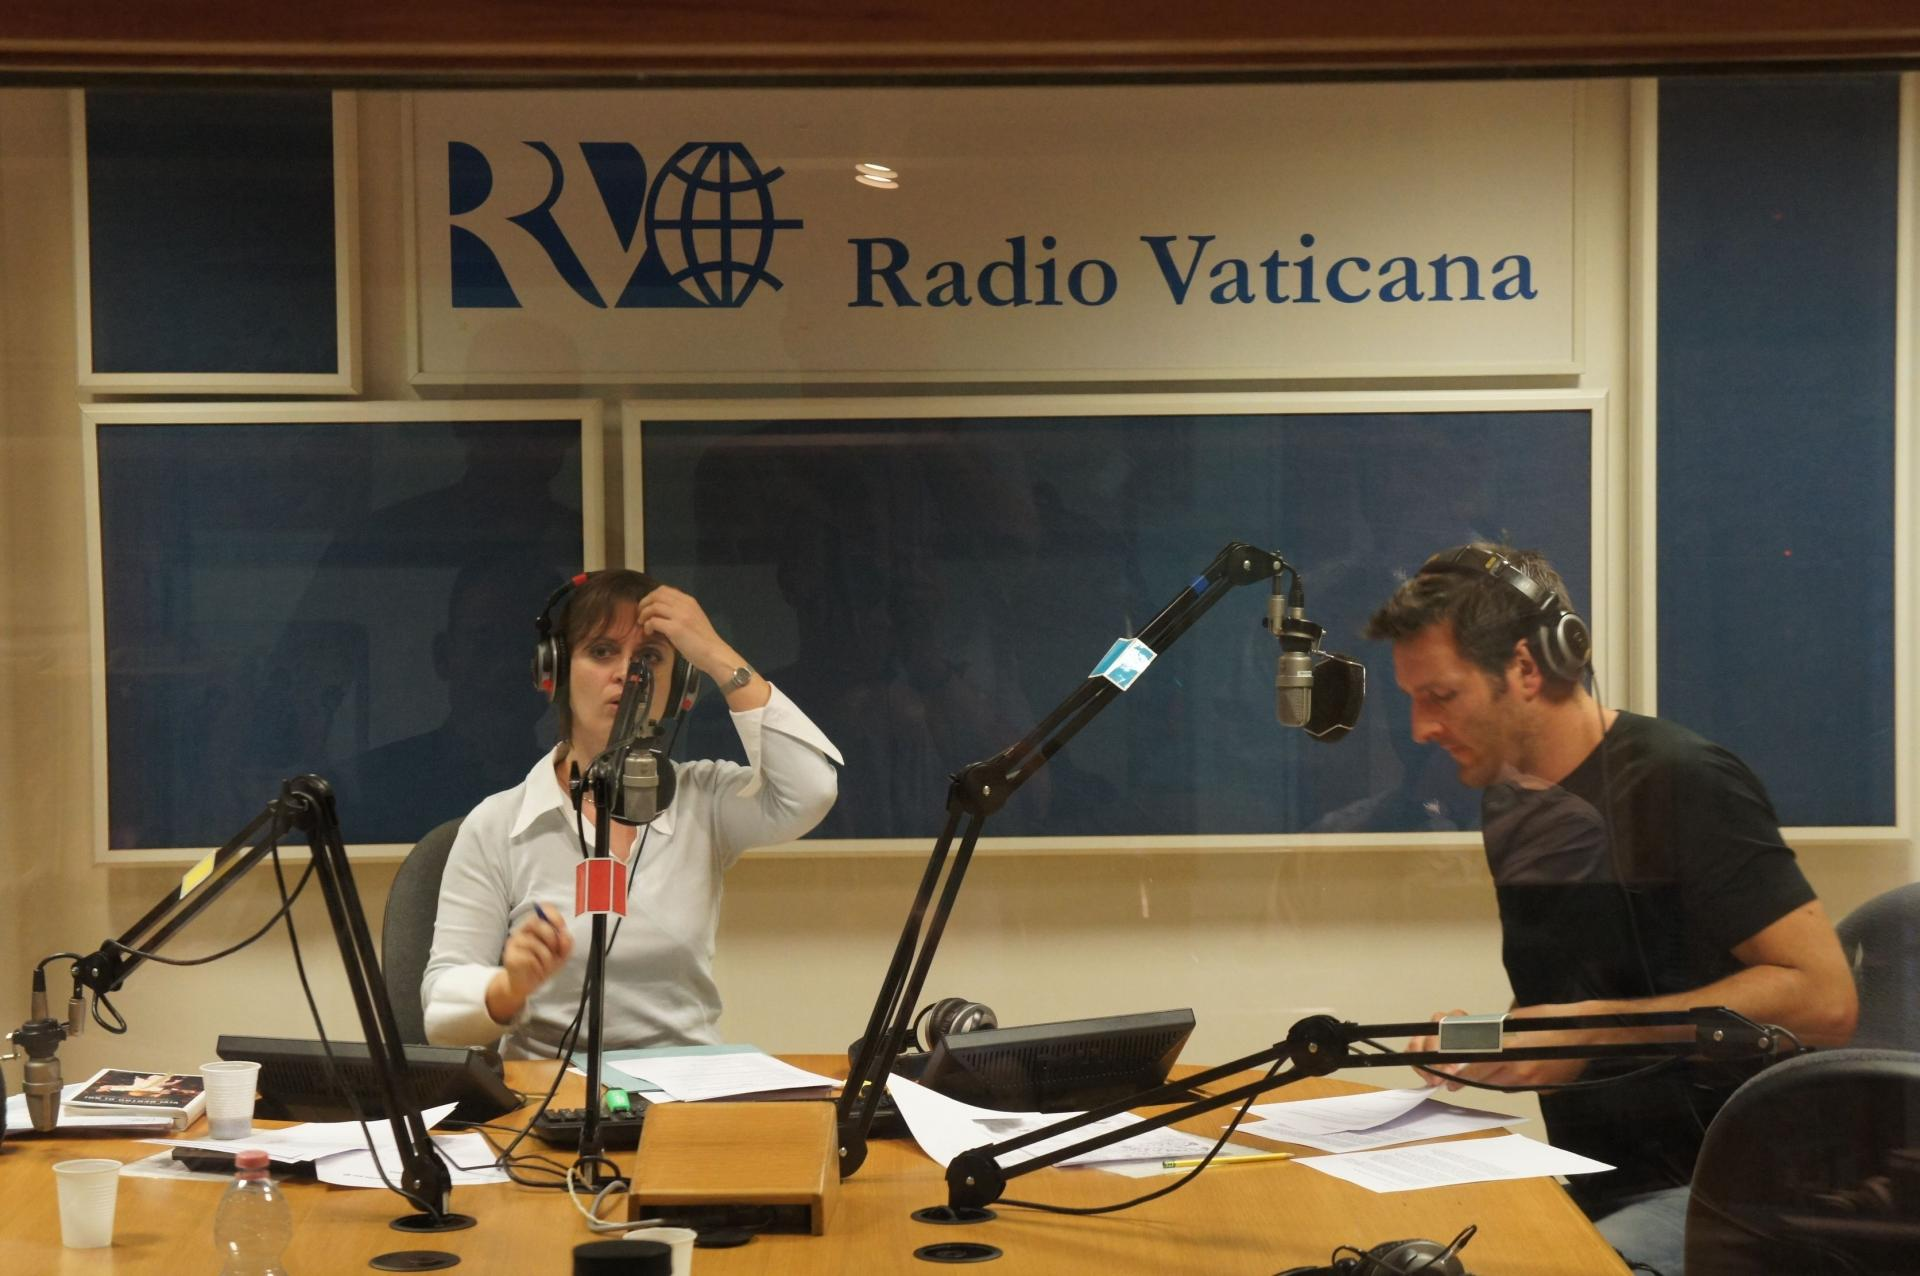 Vatican radio broadcast